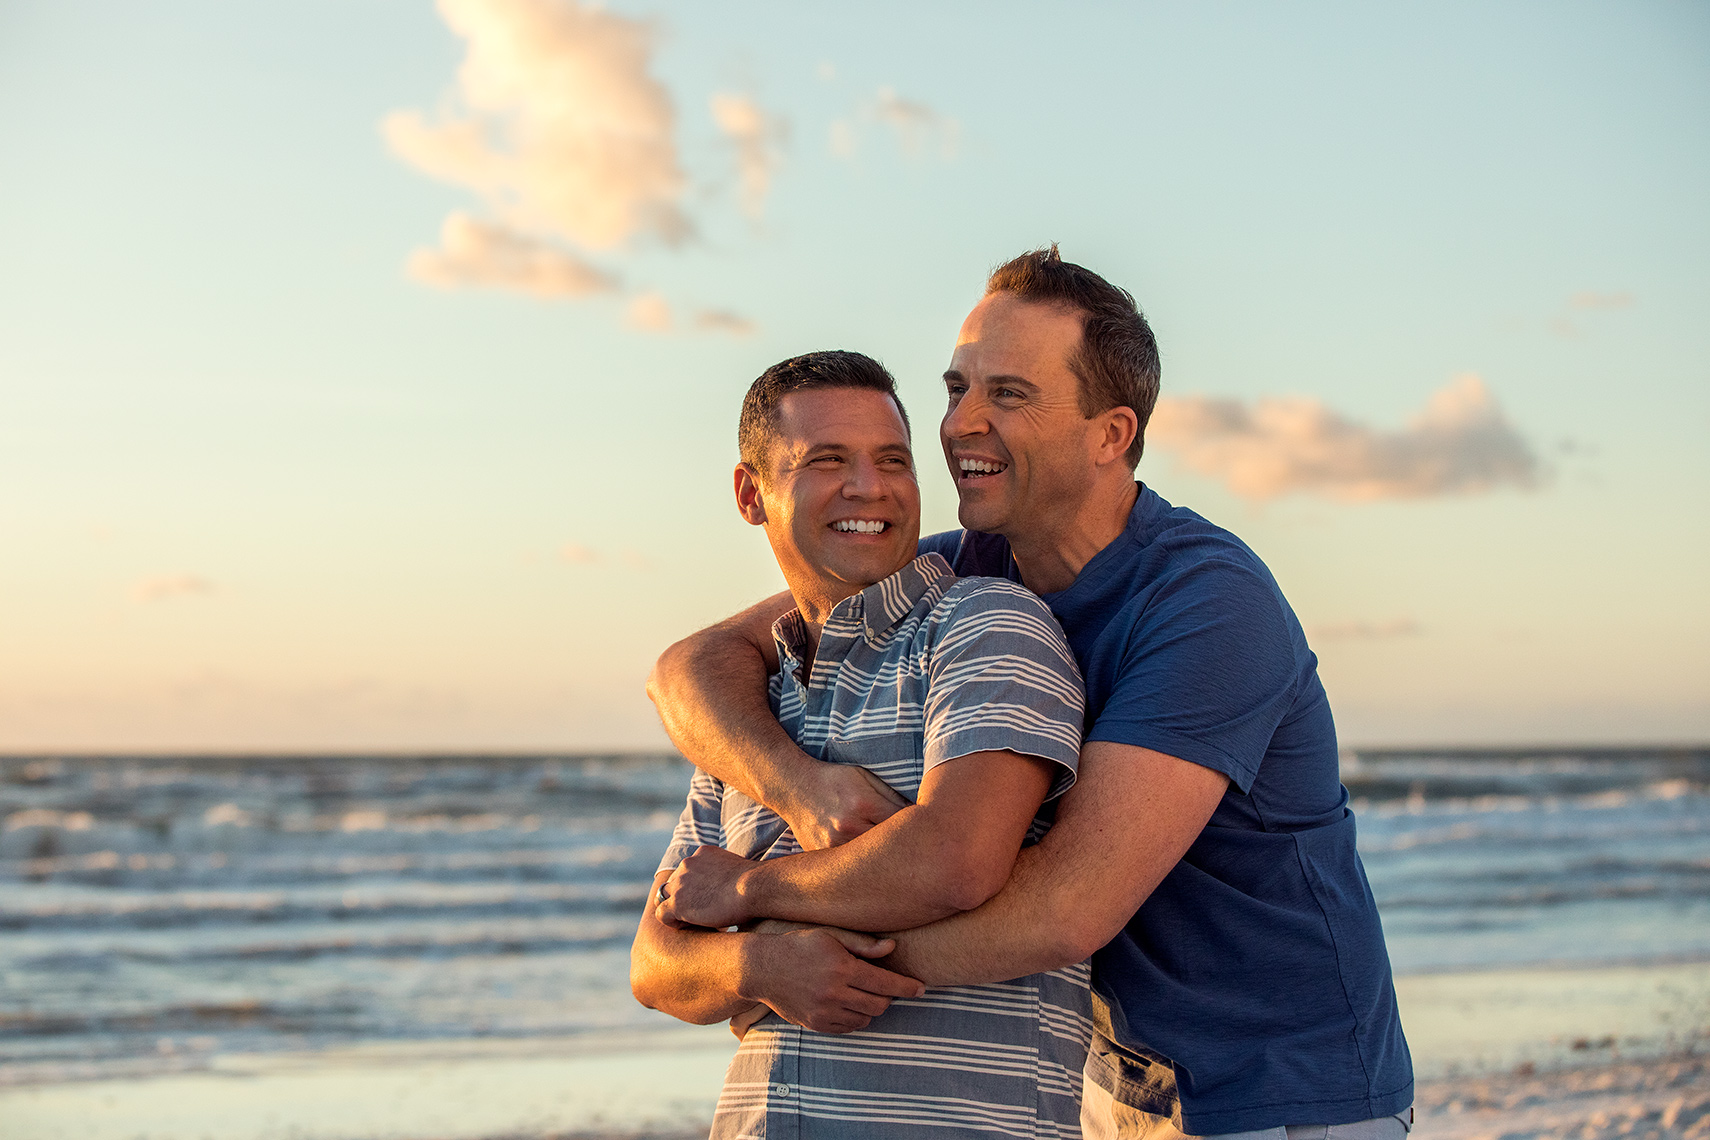 15_SunsetBeach_LGBT_Day2_13679-1.jpg